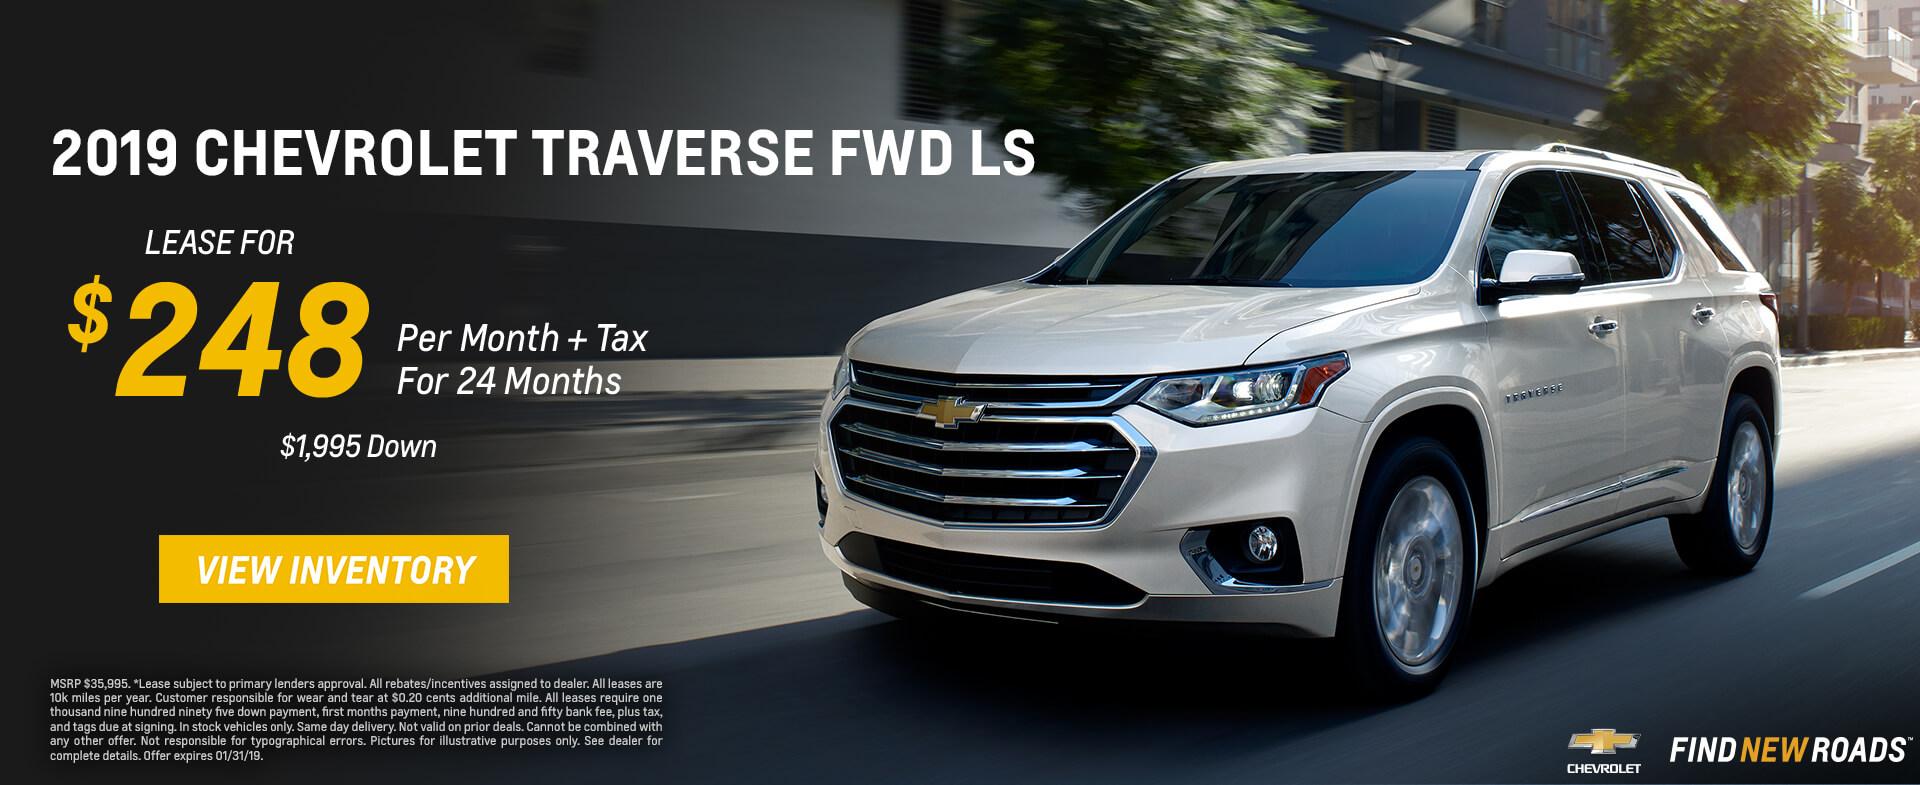 Chevrolet Traverse $248 Lease